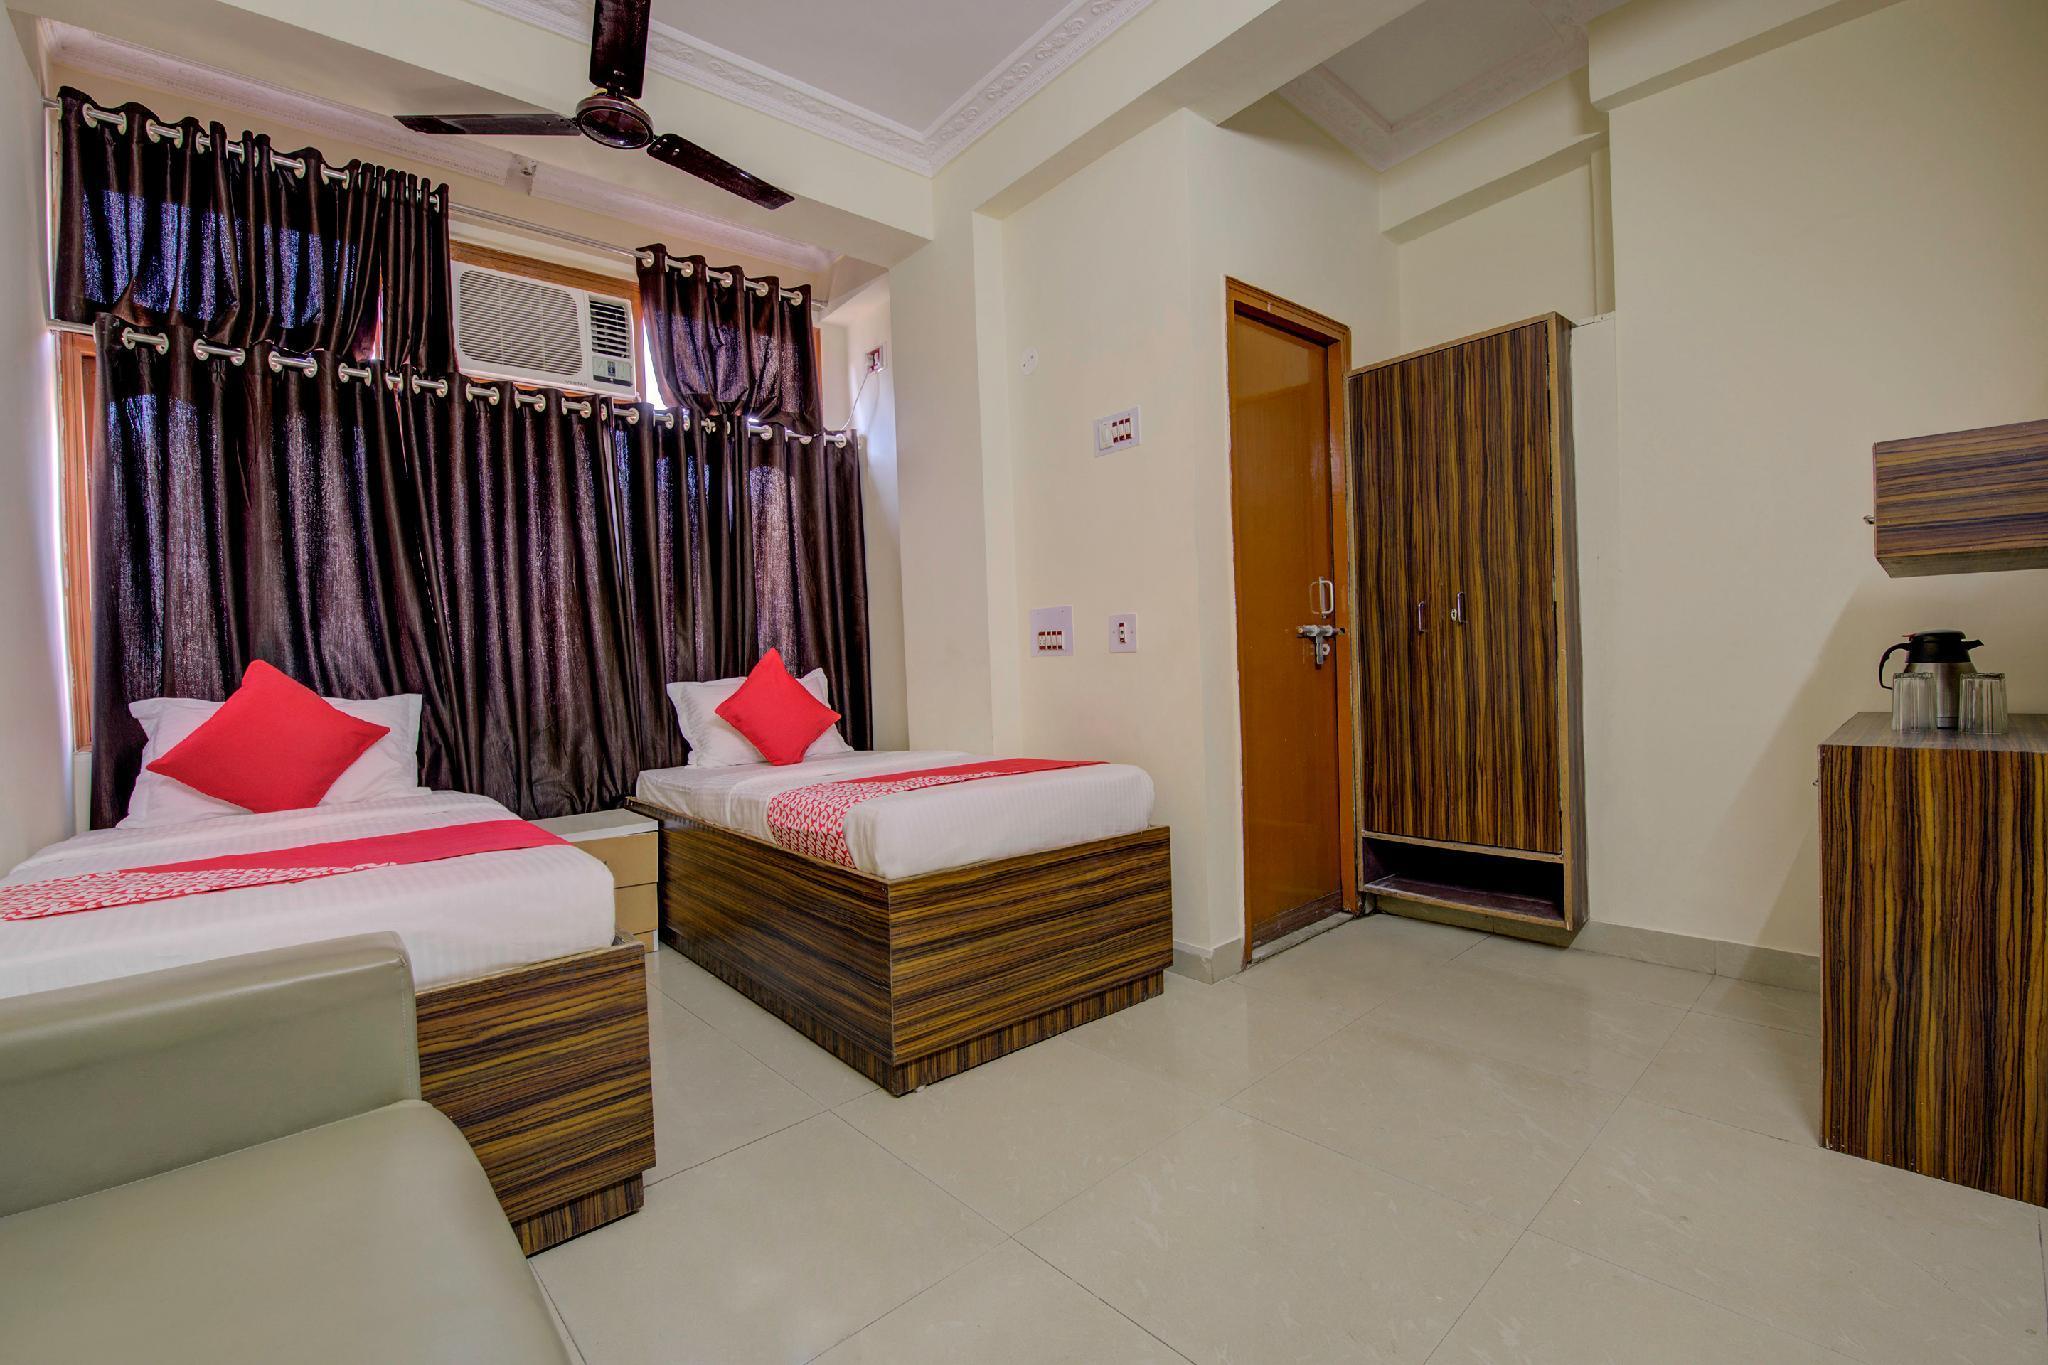 OYO 15589 Hotel Kamdhenu